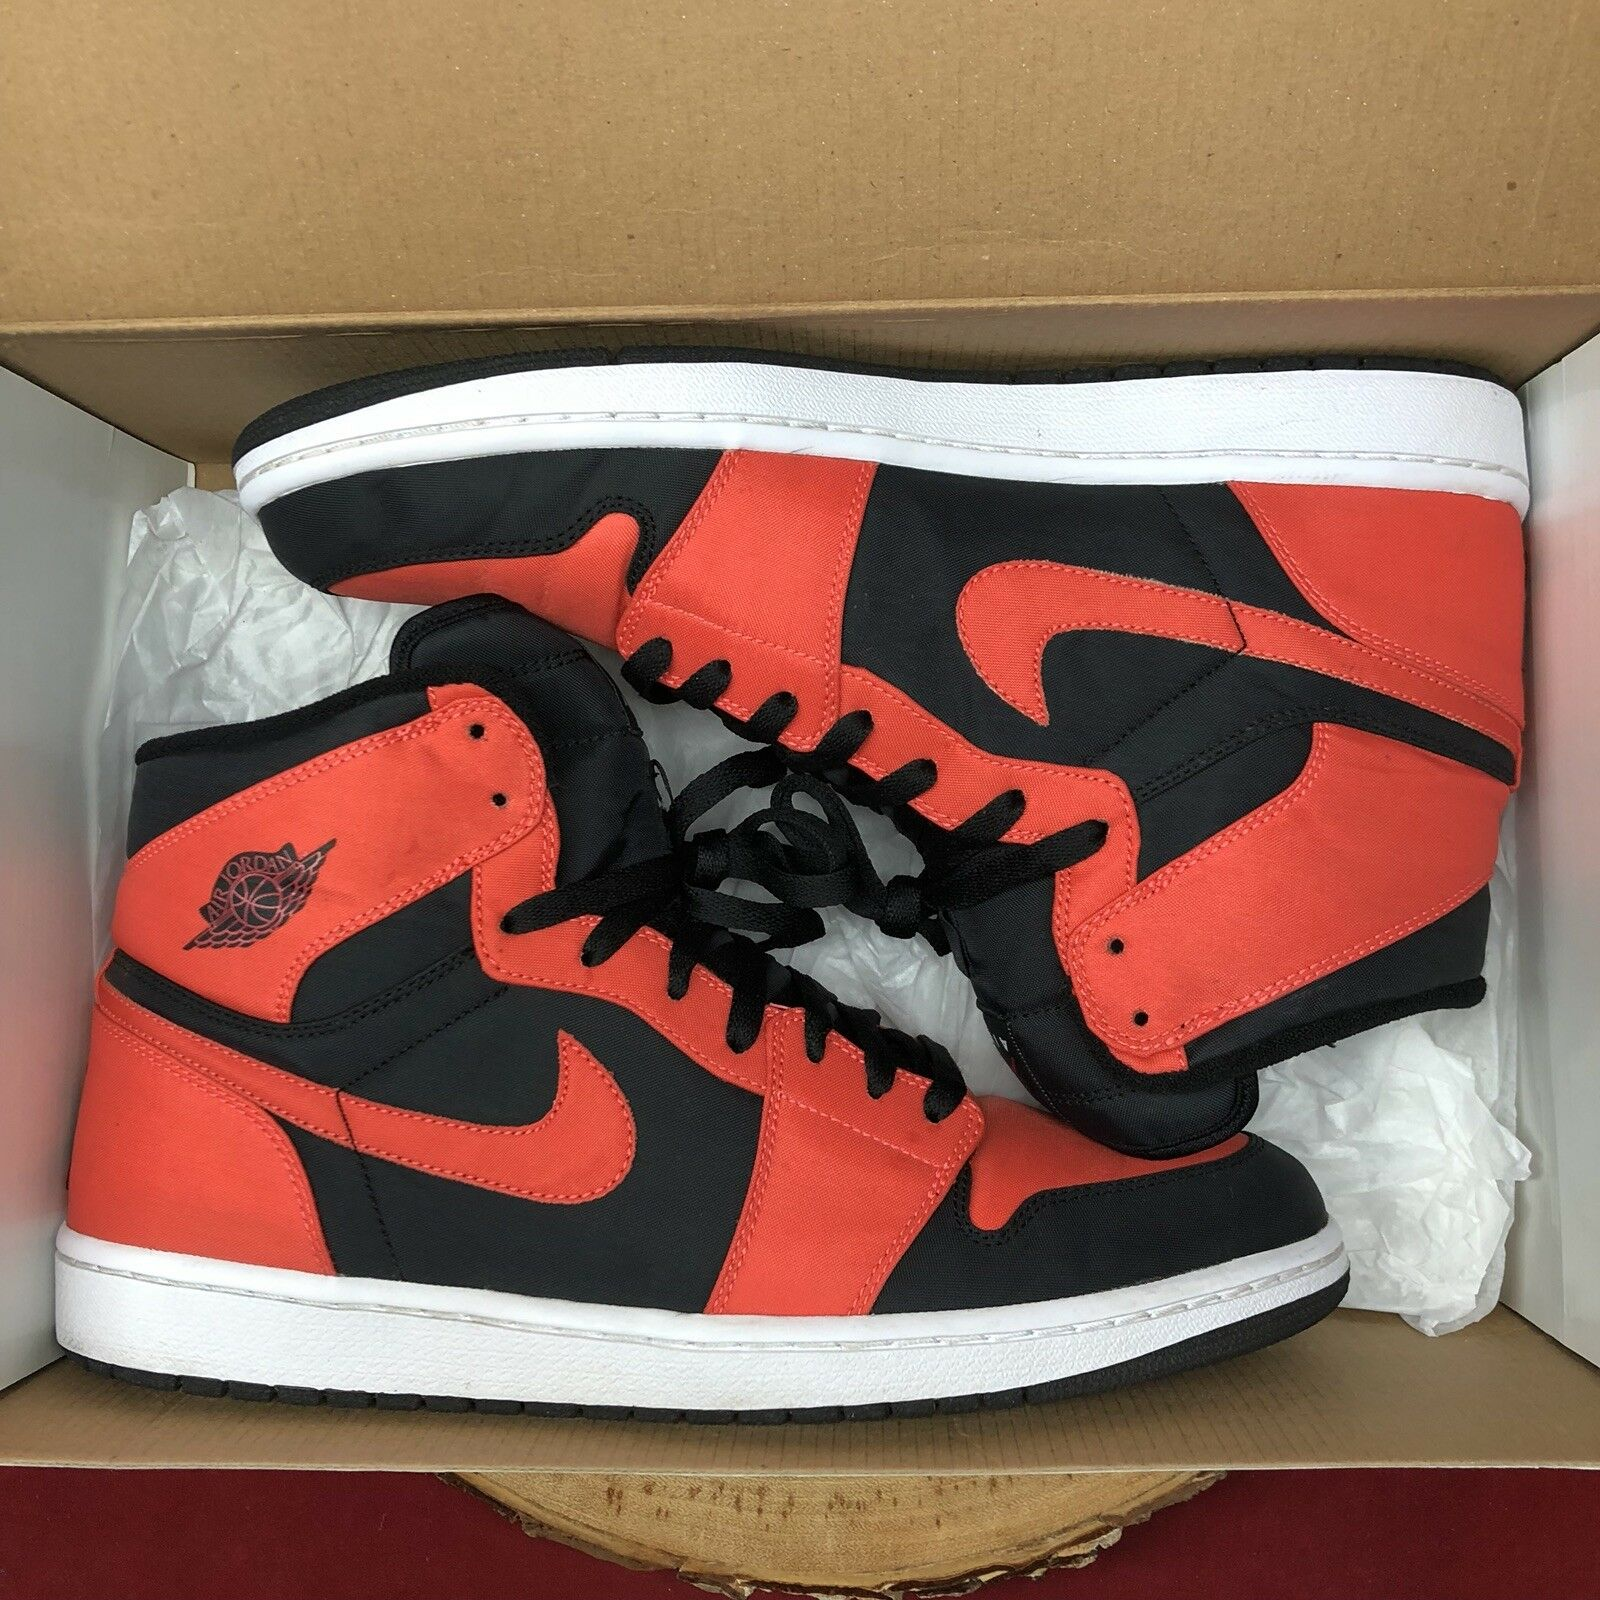 Nike air jordan 1 retro - hohe größe 12 344613-061 schwarz max orange 344613-061 12 cremefarbene gezüchtet bb2c97